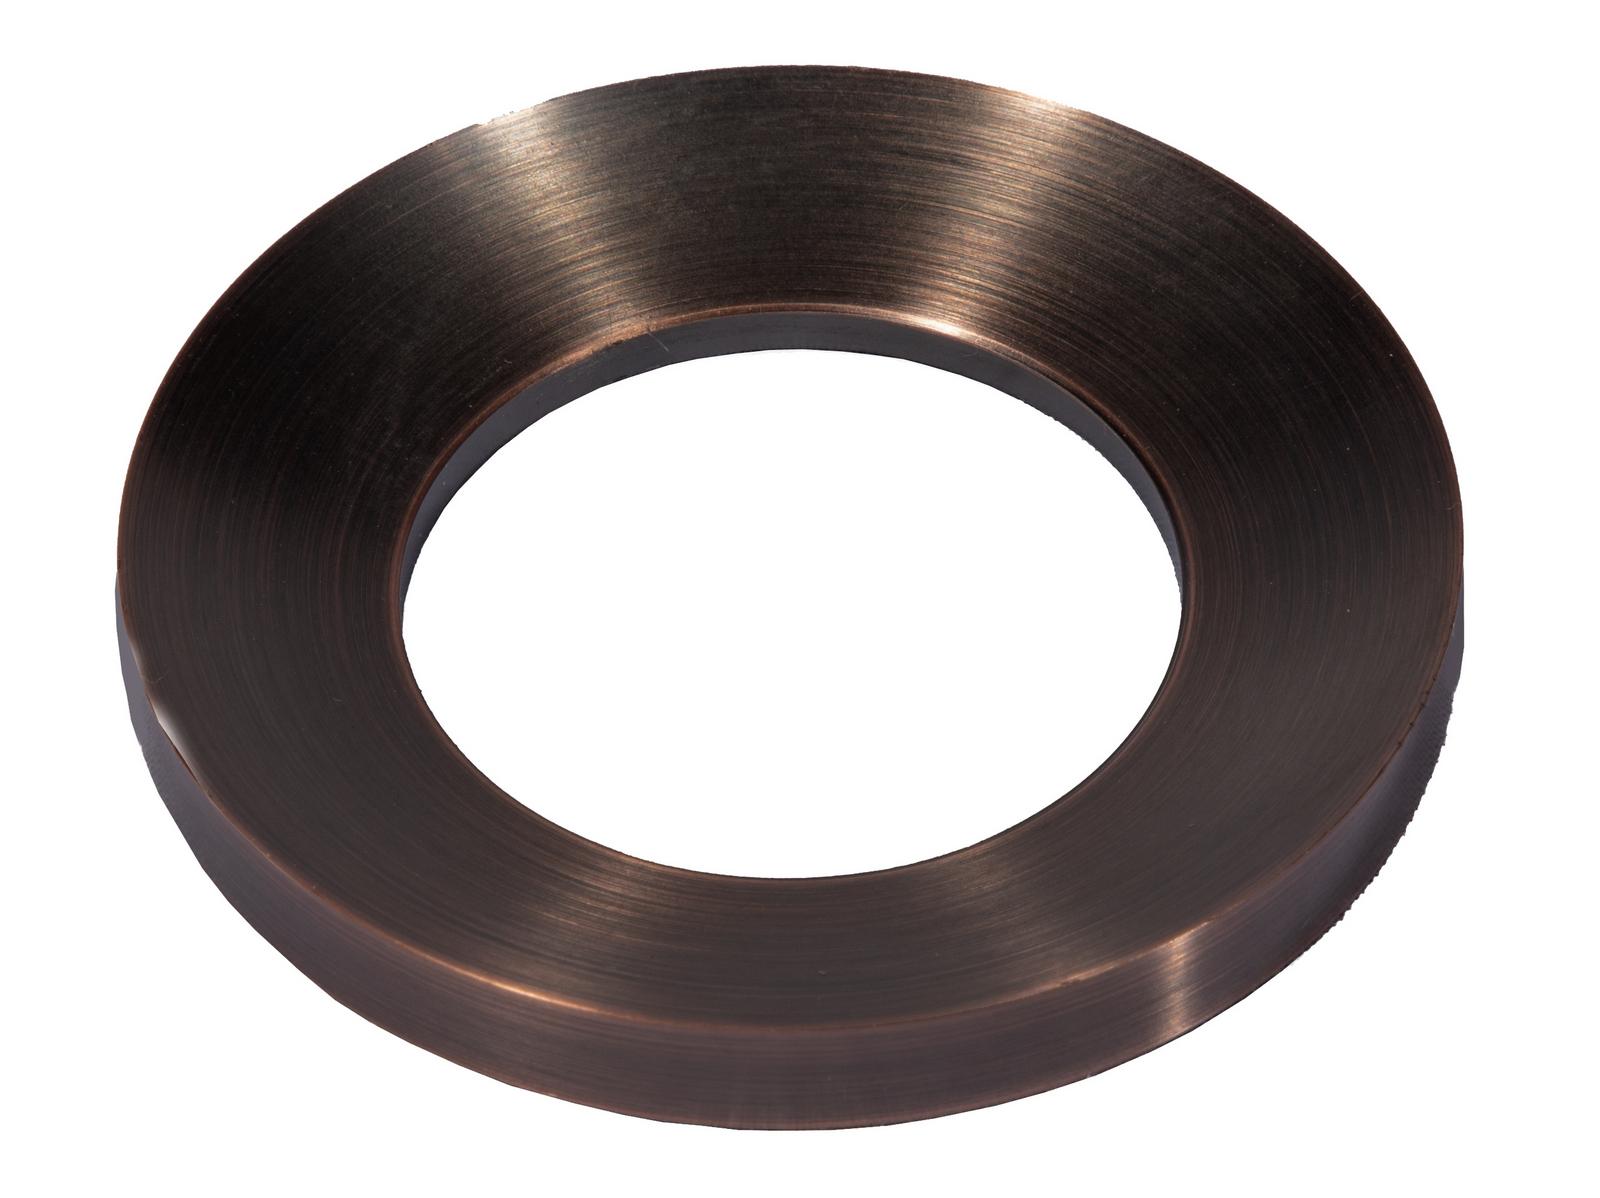 Eden Bath Vessel Sink Mounting Ring - Oil Rubbed Bronze